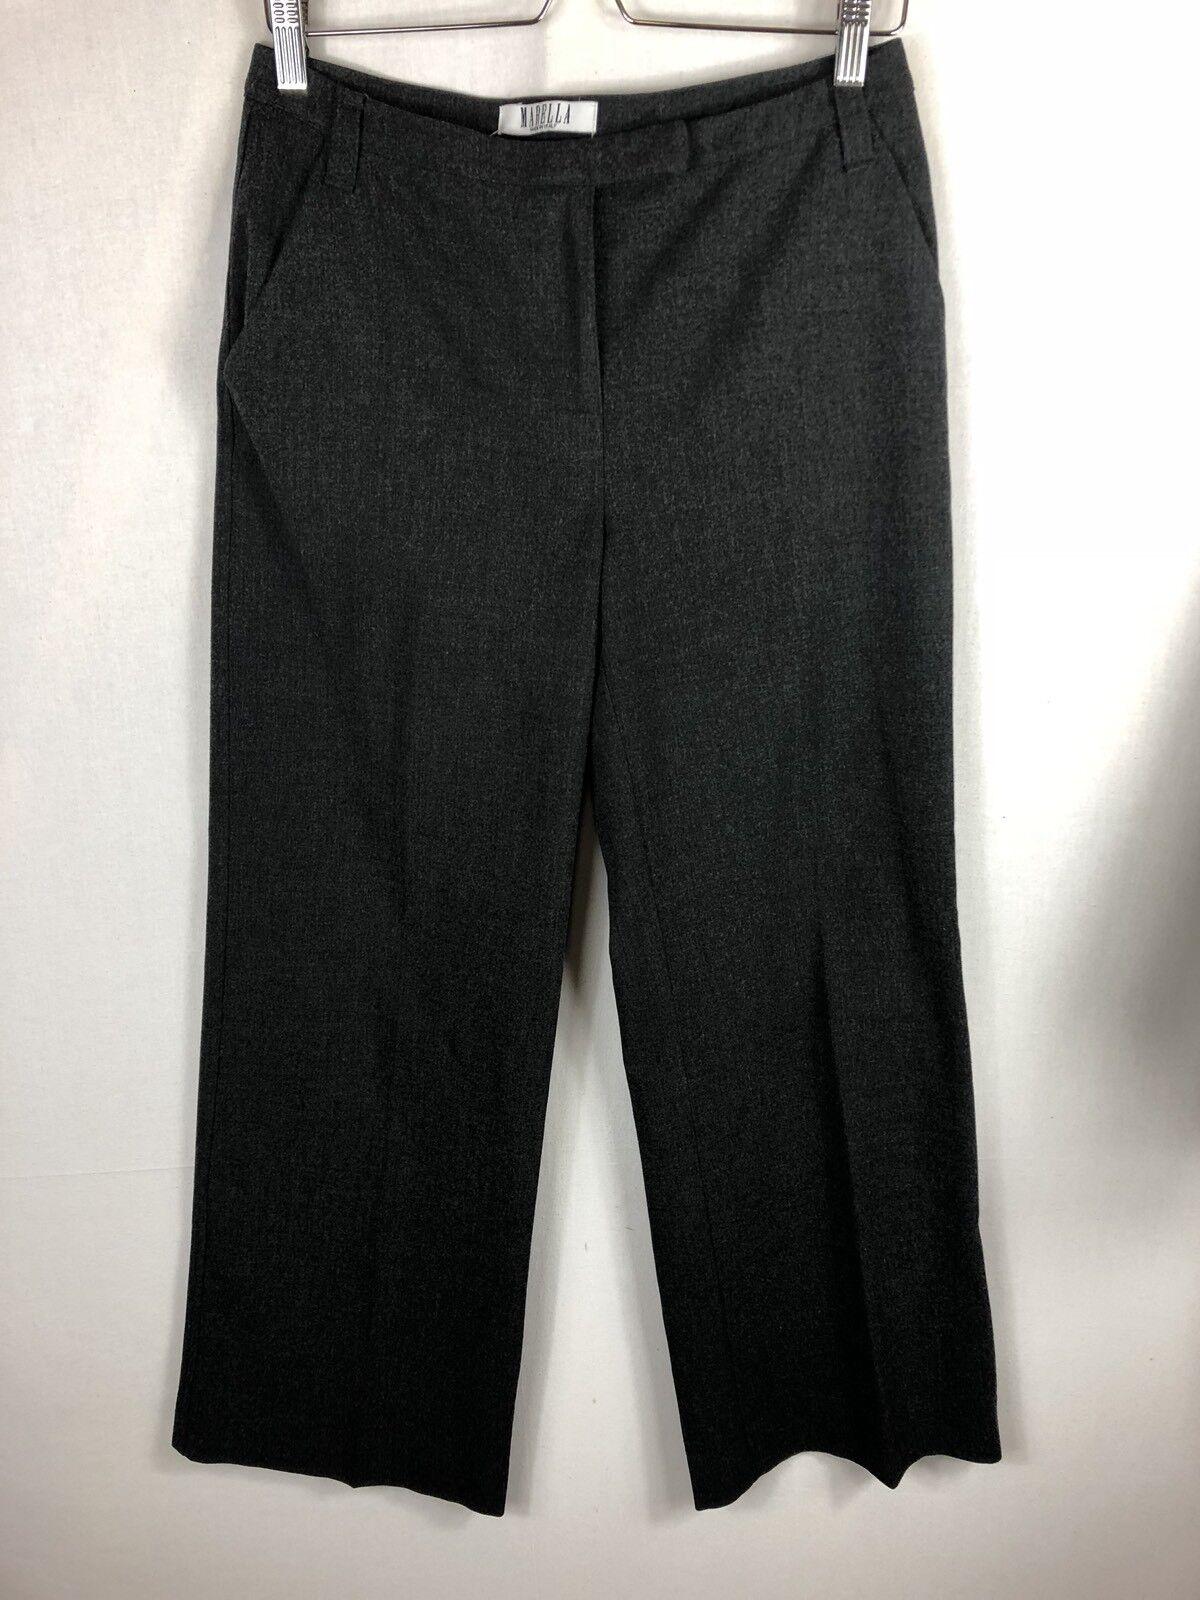 Ladies MARELLA MAX MARA Size 10 Charcoal Grey Tailored Trousers Straight Leg